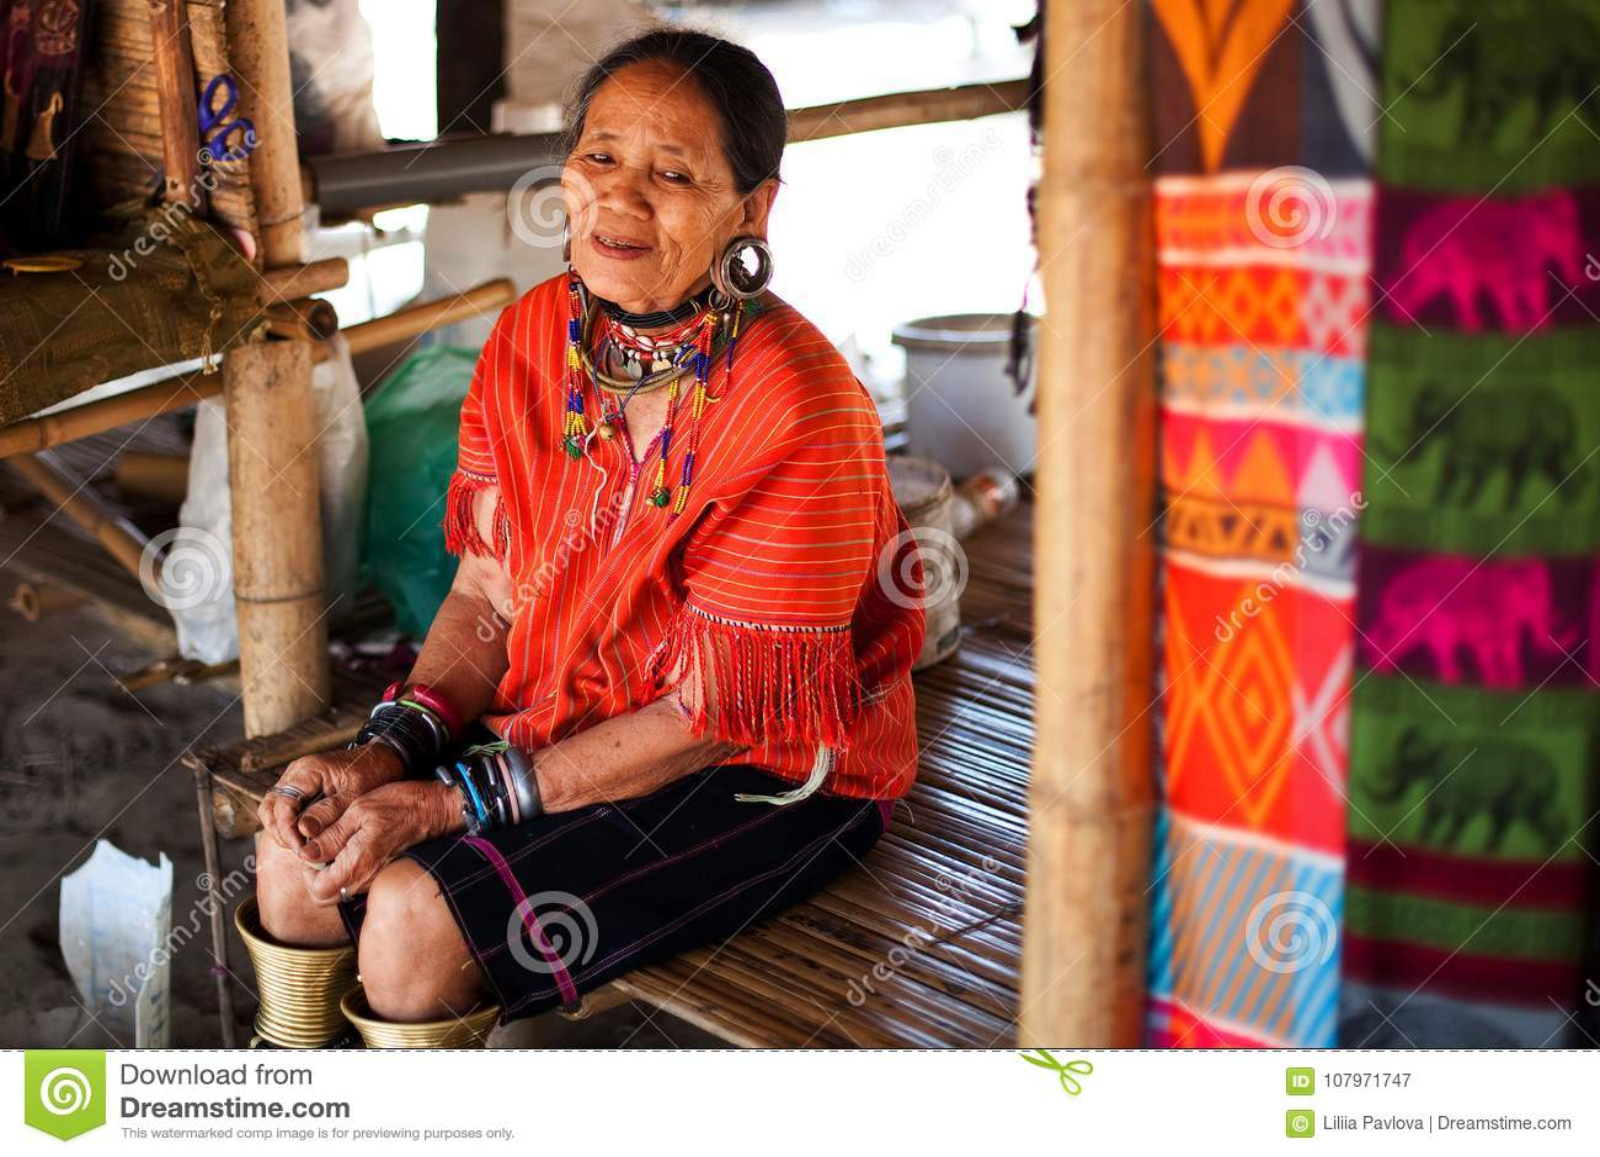 Chiang Mai, Thailand - 22. April 2015: Das Dorf von langhalsigen Frauen Hilltribe-Dörfer